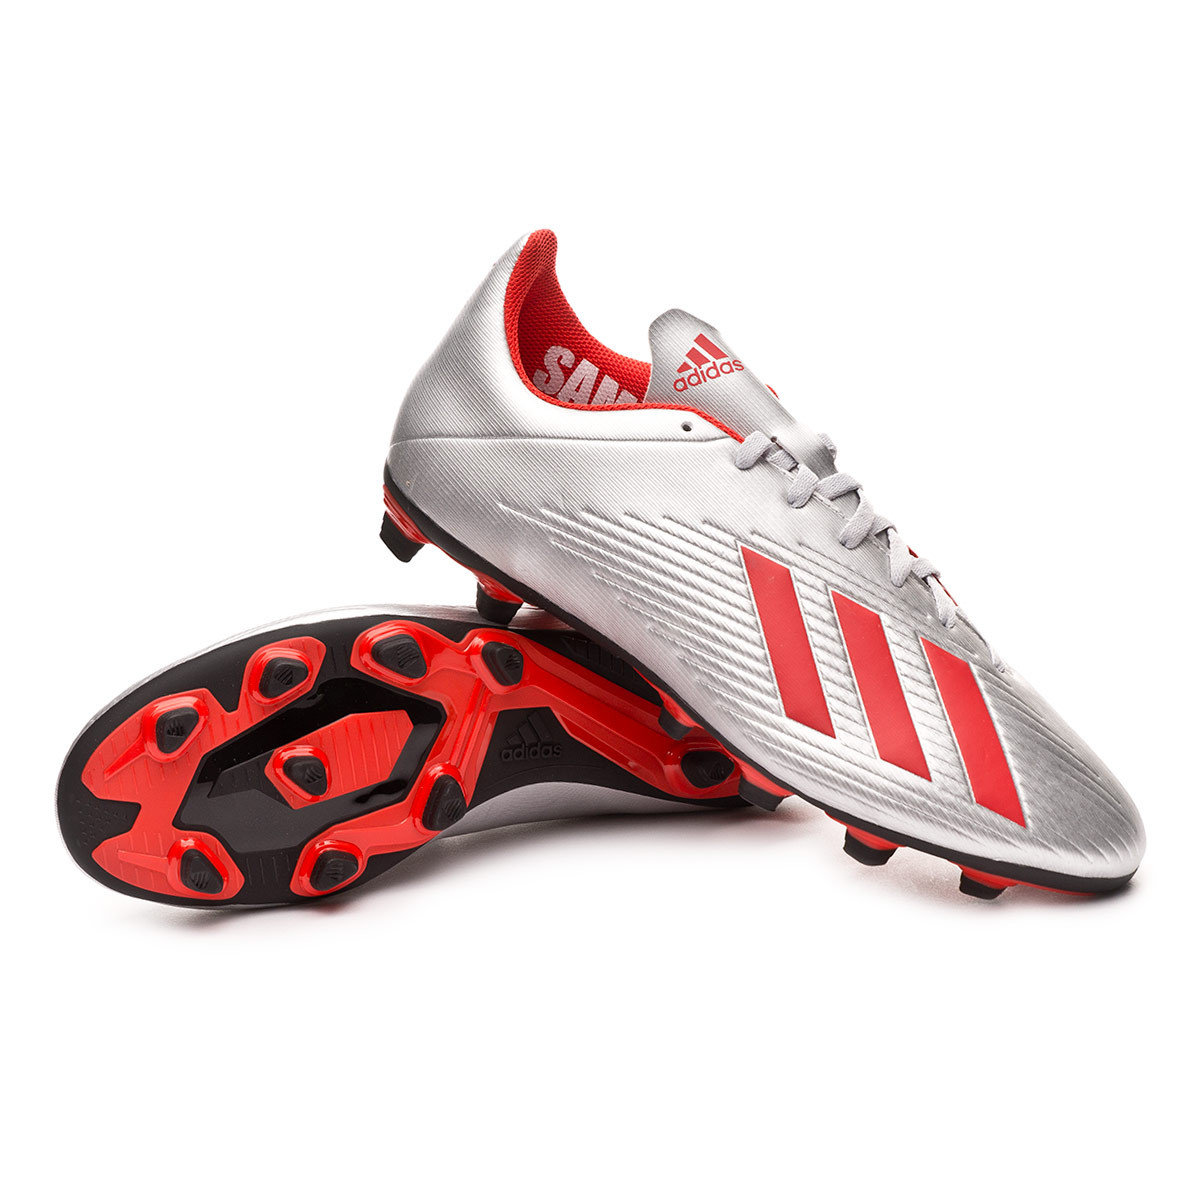 1e0de5900 Football Boots adidas X 19.4 FxG Silver metallic-Hi red-Core black -  Football store Fútbol Emotion